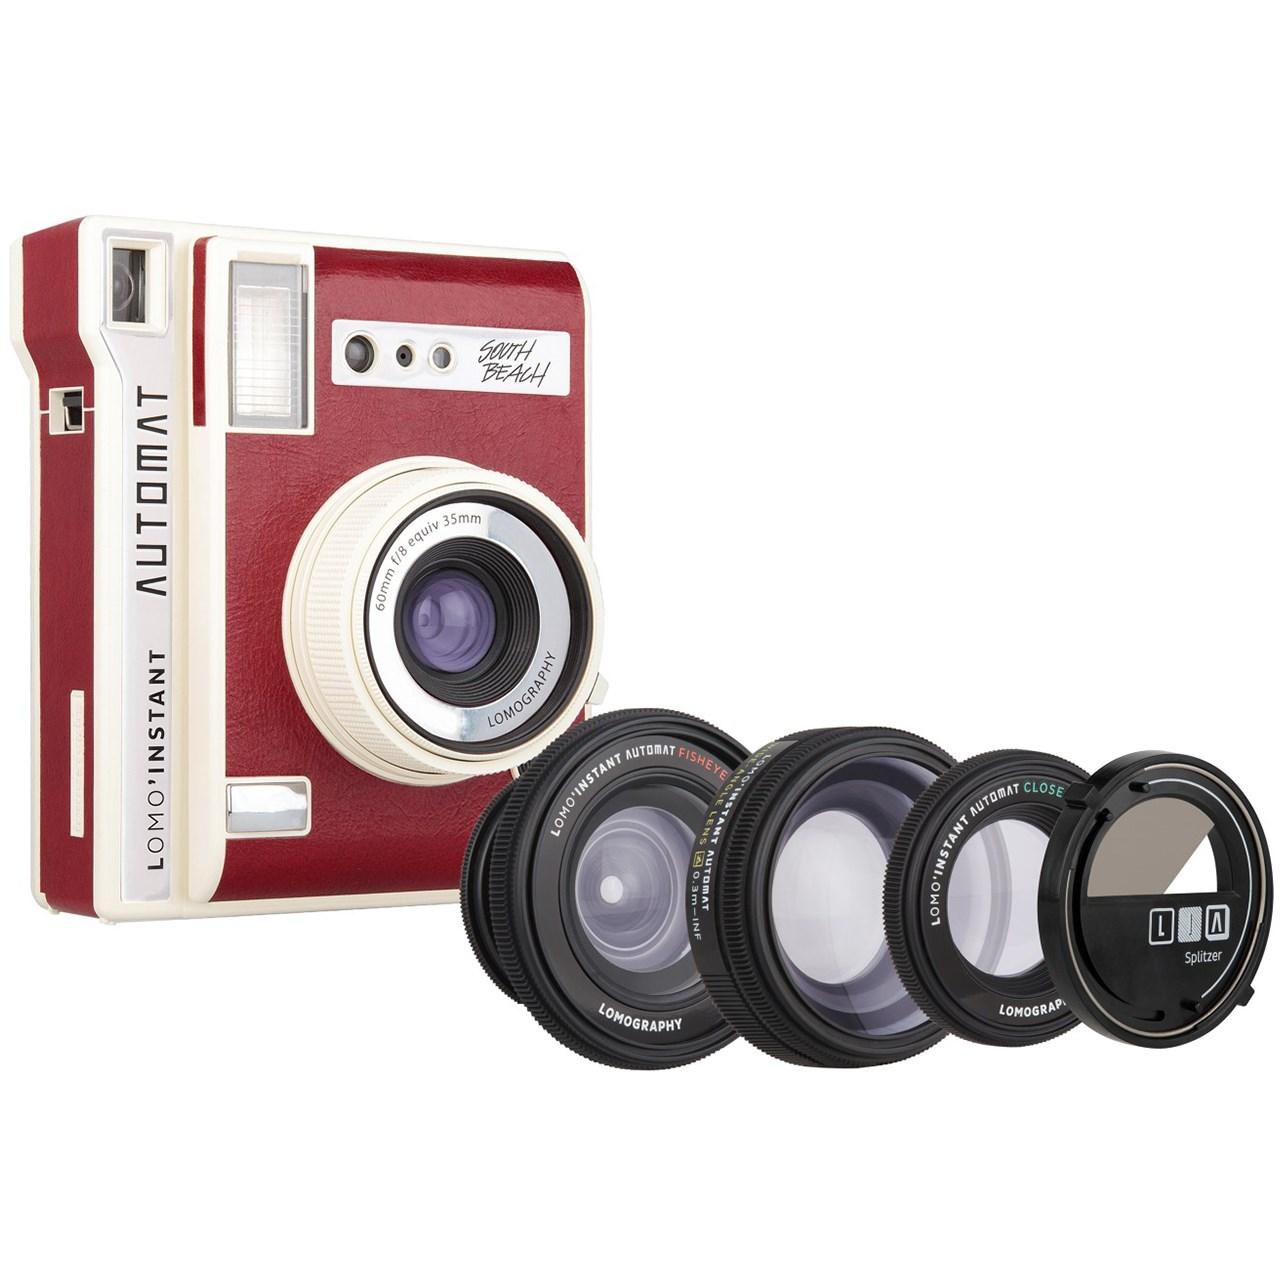 دوربین چاپ سریع لوموگرافی مدل Automat-South Beach به همراه سه لنز